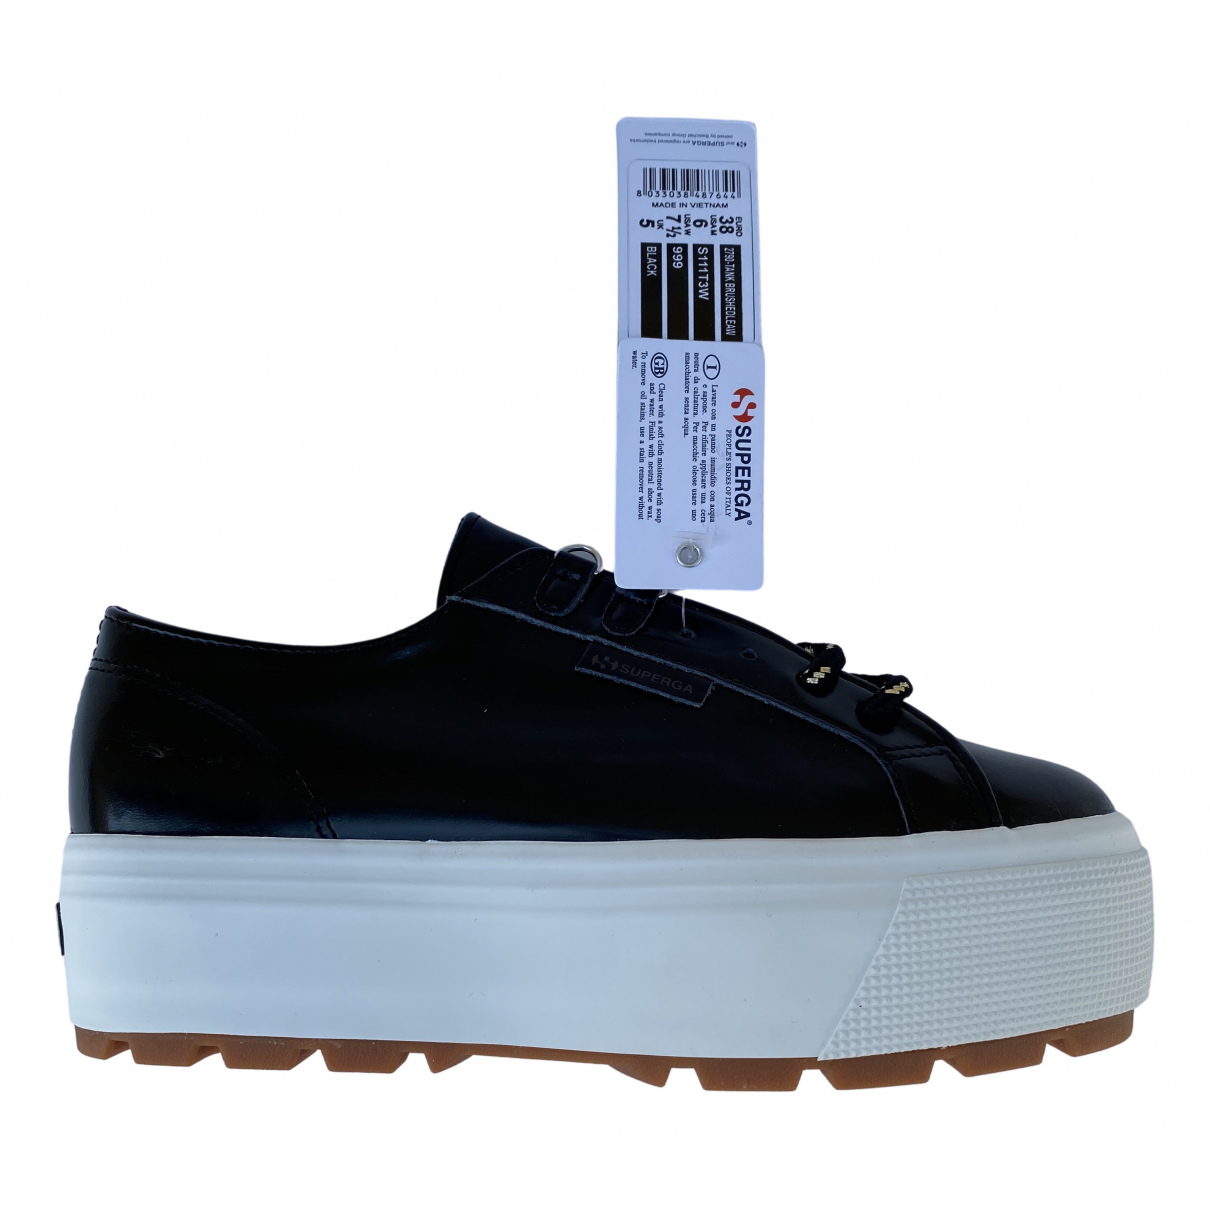 Superga \N Sneakers in  Schwarz Kautschuk